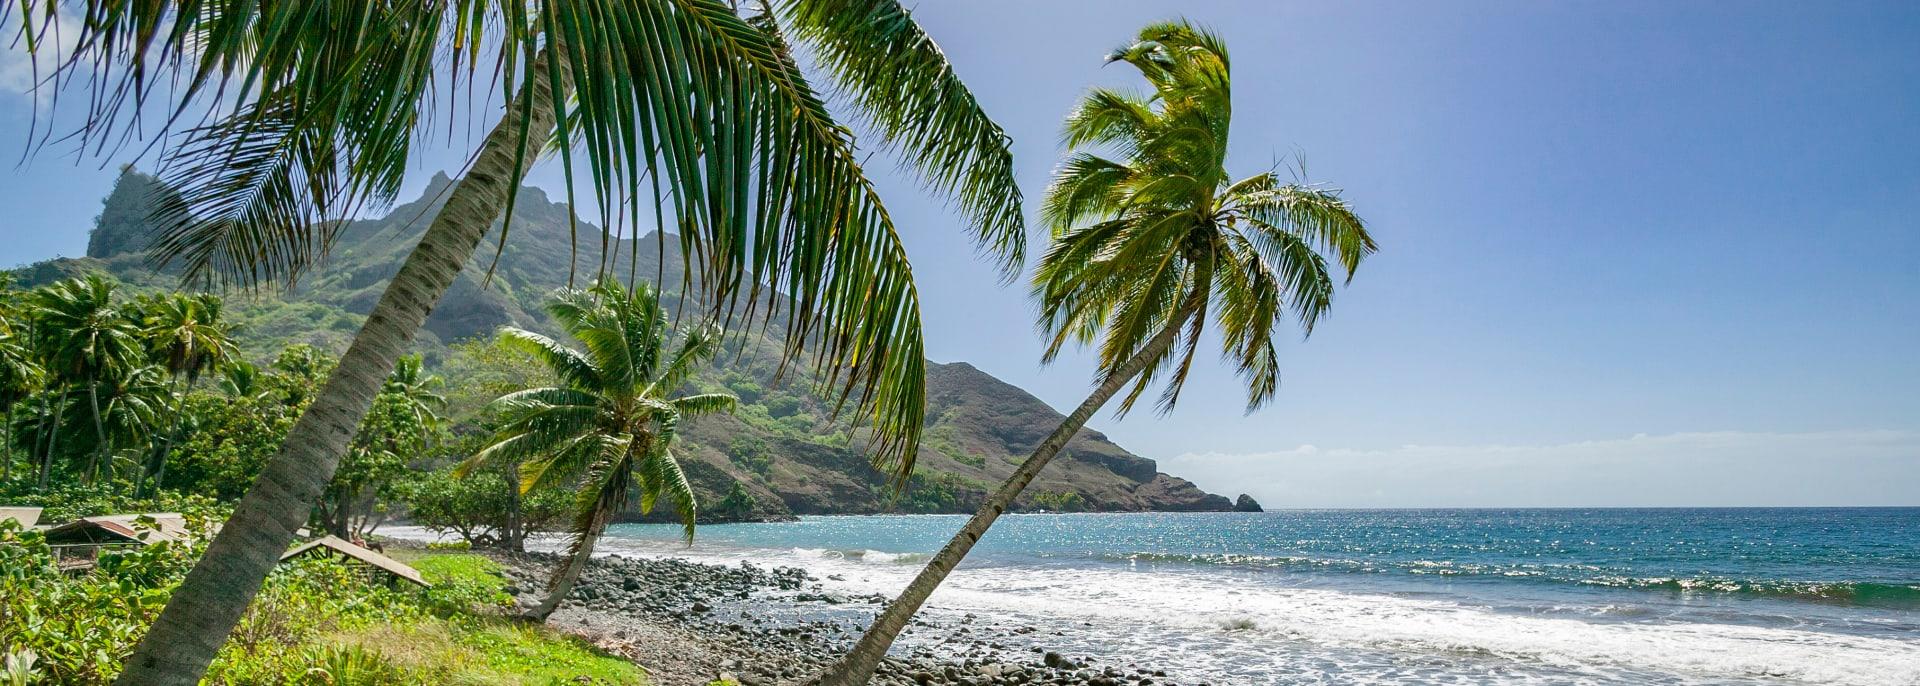 Hiva Oa, Französisch Polynesien